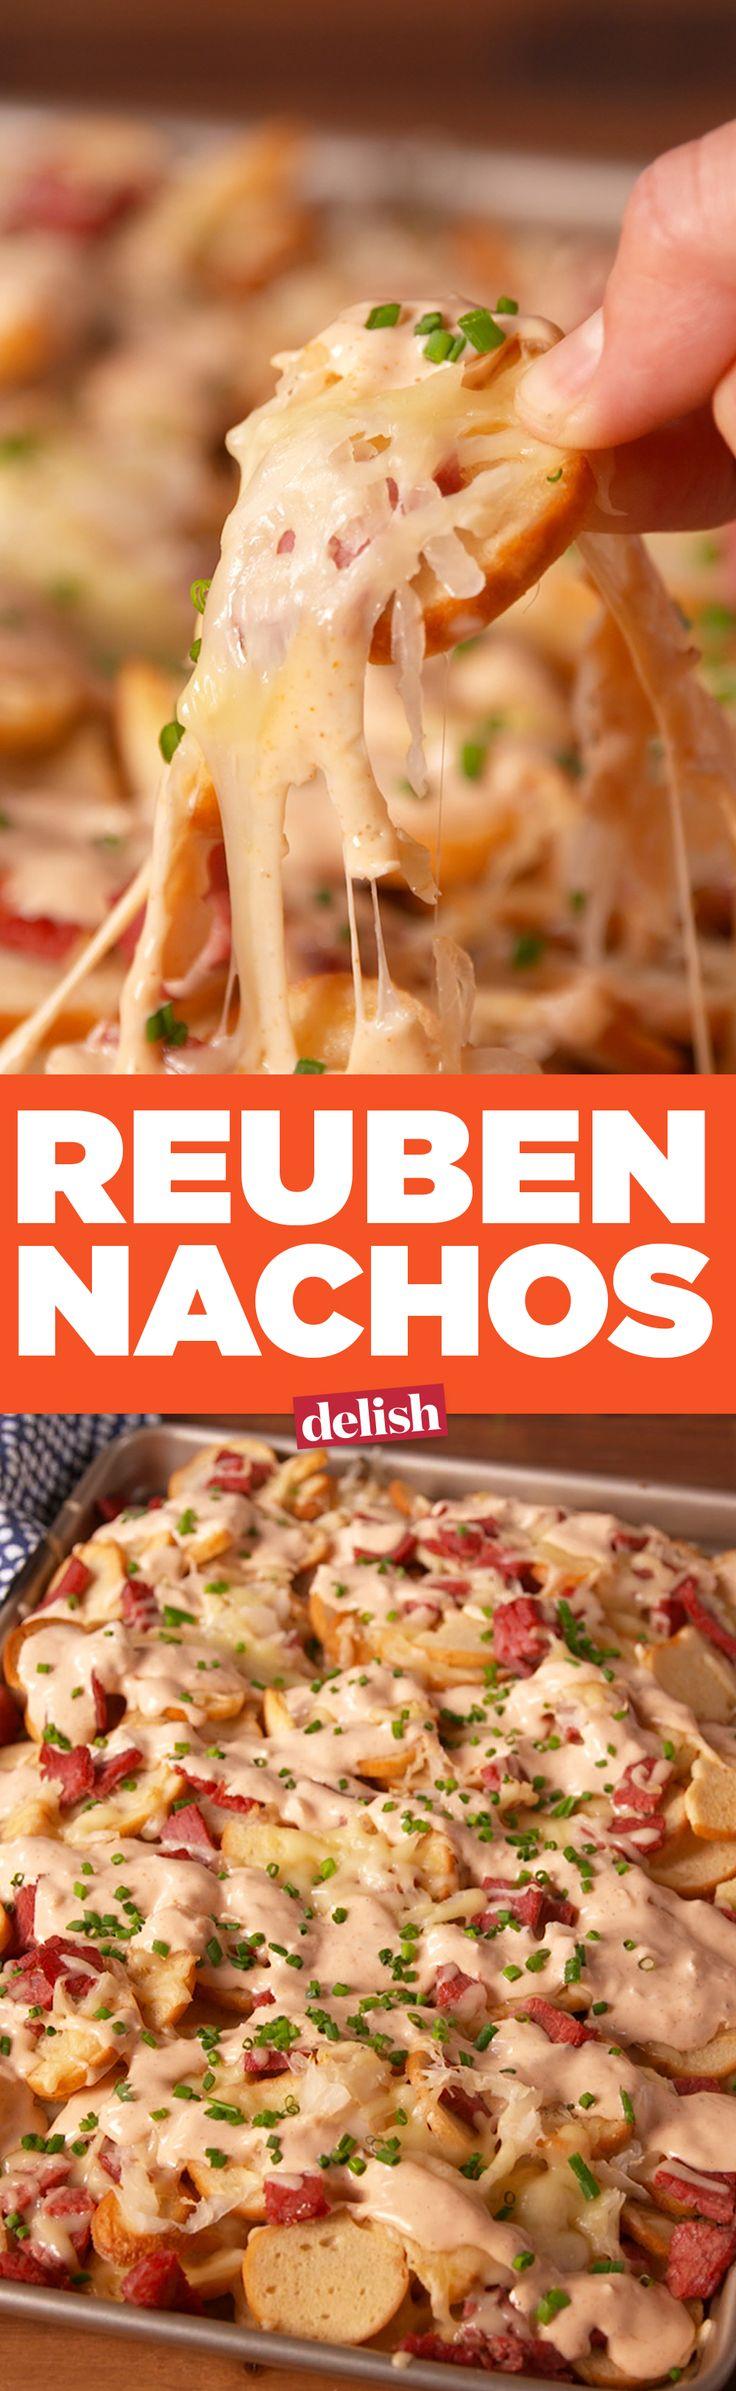 Forget sandwiches—make Reuben Nachos. Get the recipe on Delish.com.